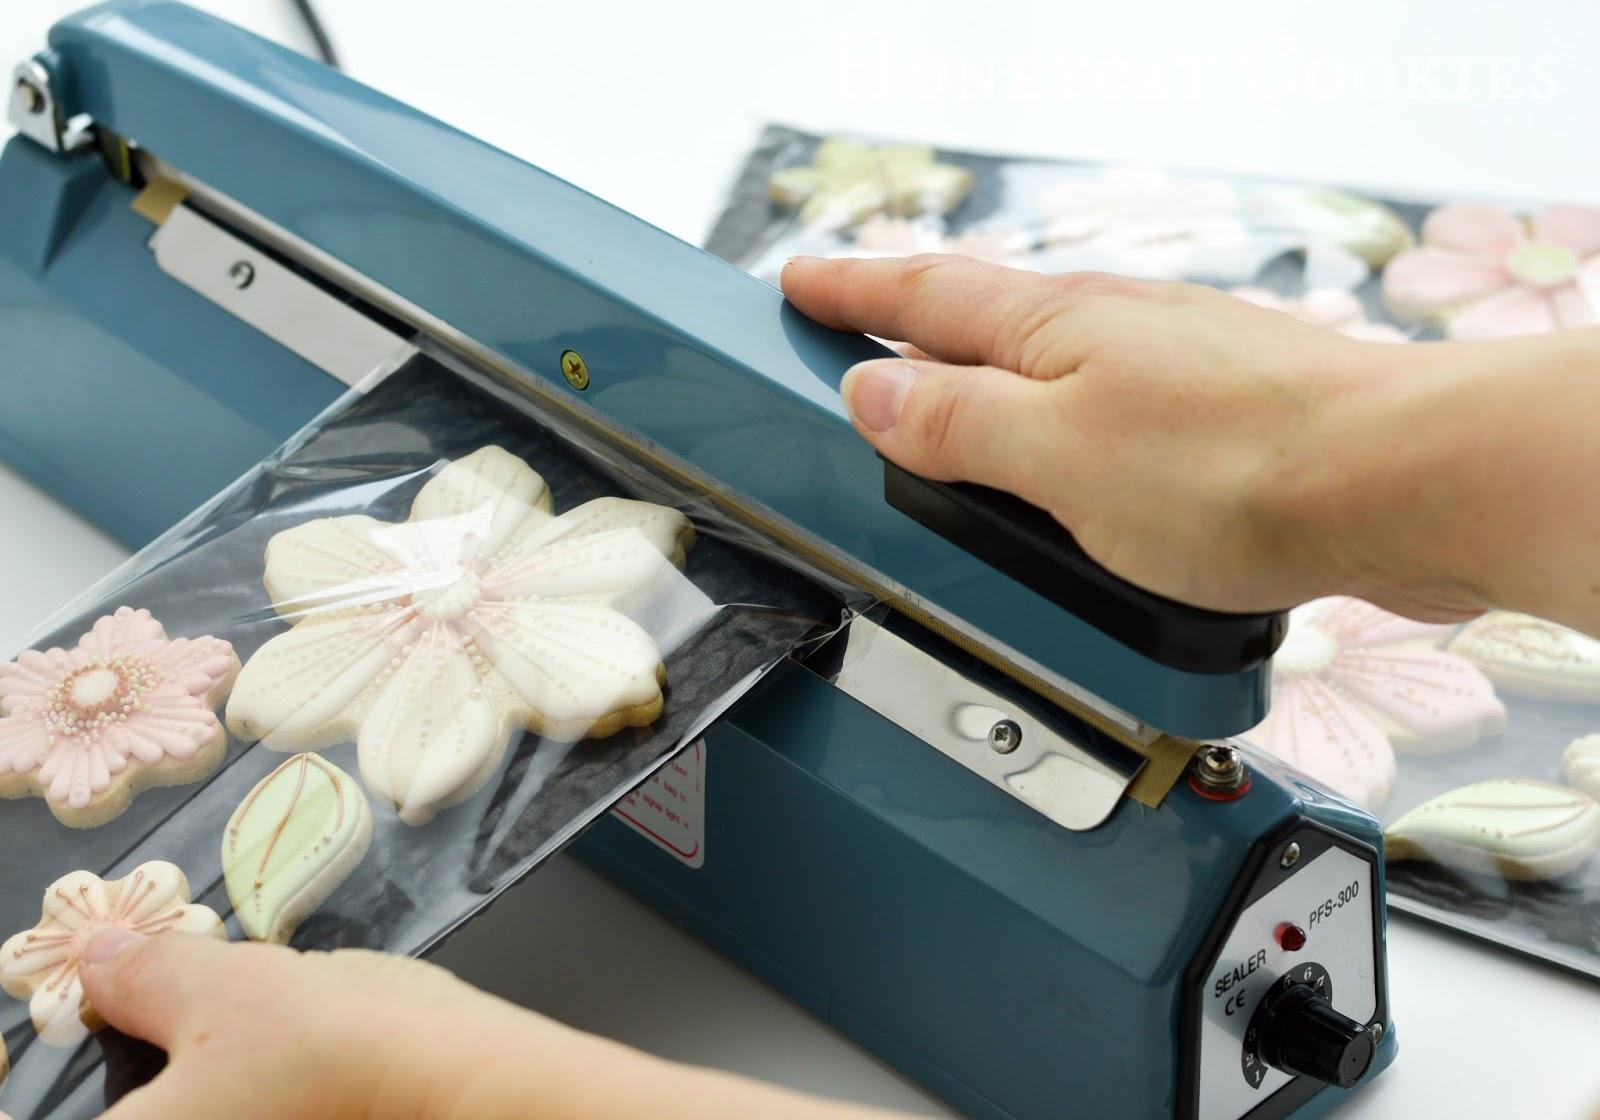 Shot of heatsealer in action sealing up layers of flower cookies, by Honeycat Cookies.